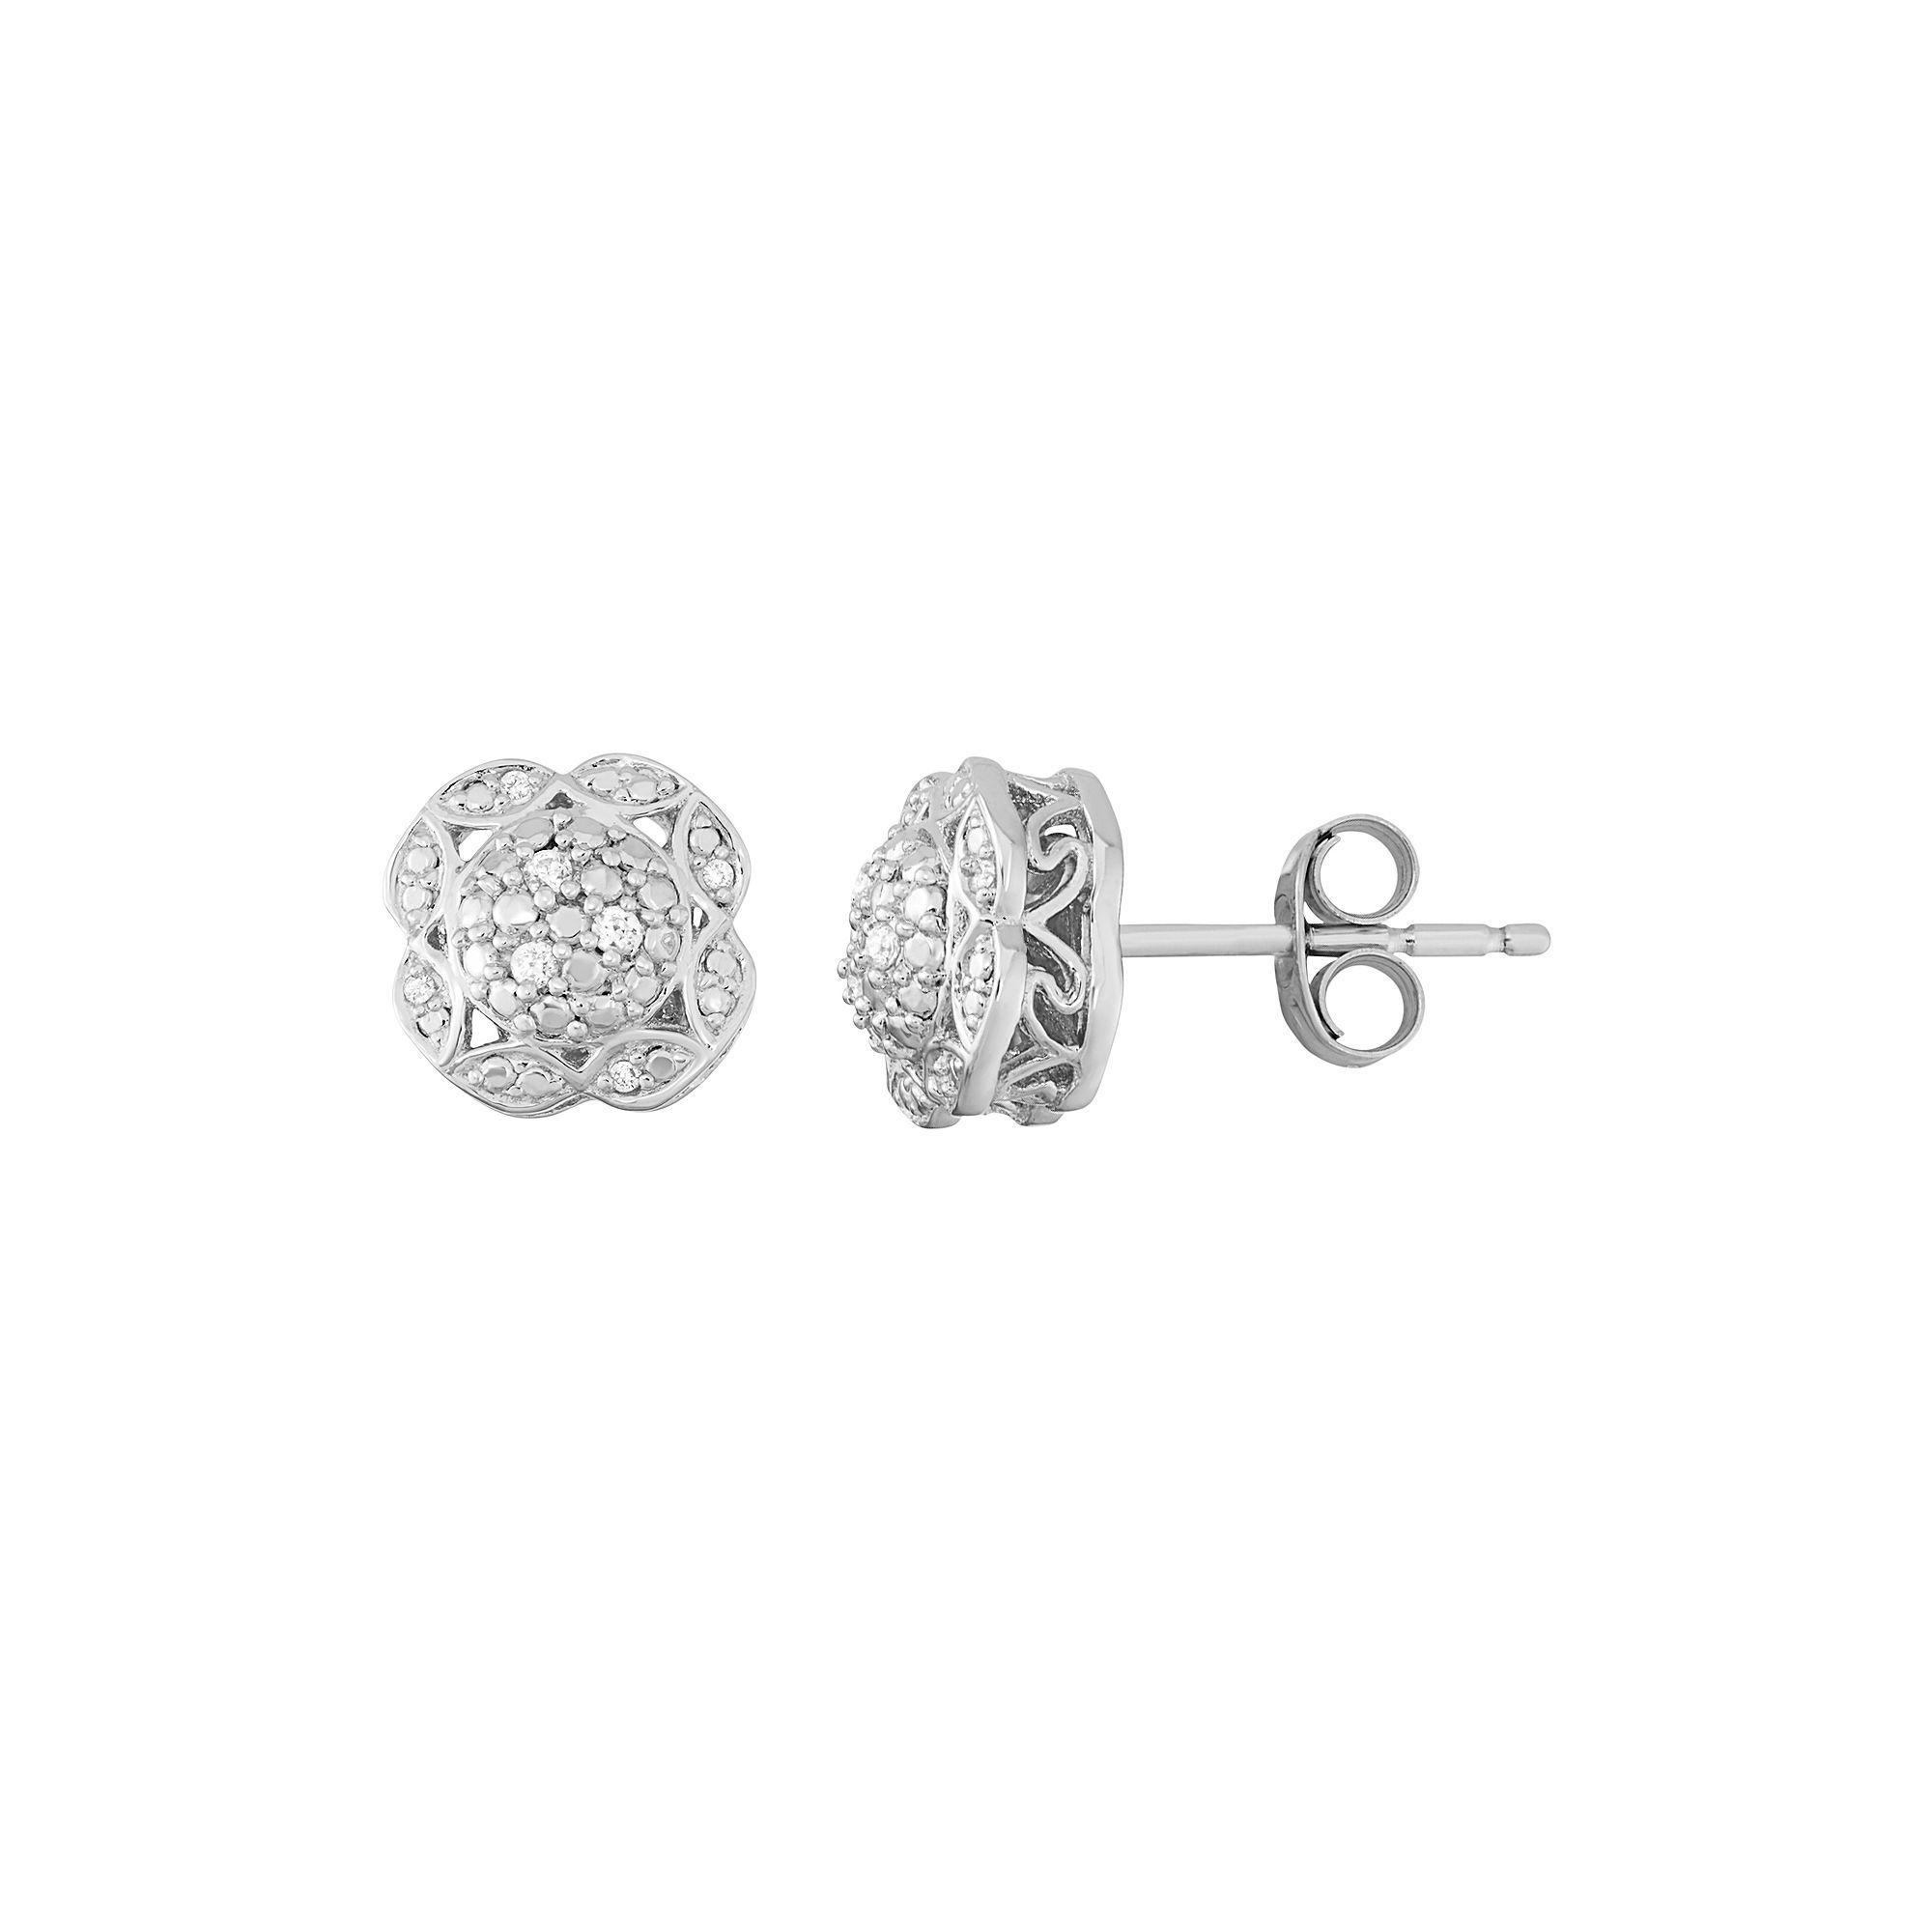 1eedc5d01544d Simply Vera Vera Wang Sterling Silver Diamond Accent Flower Stud ...